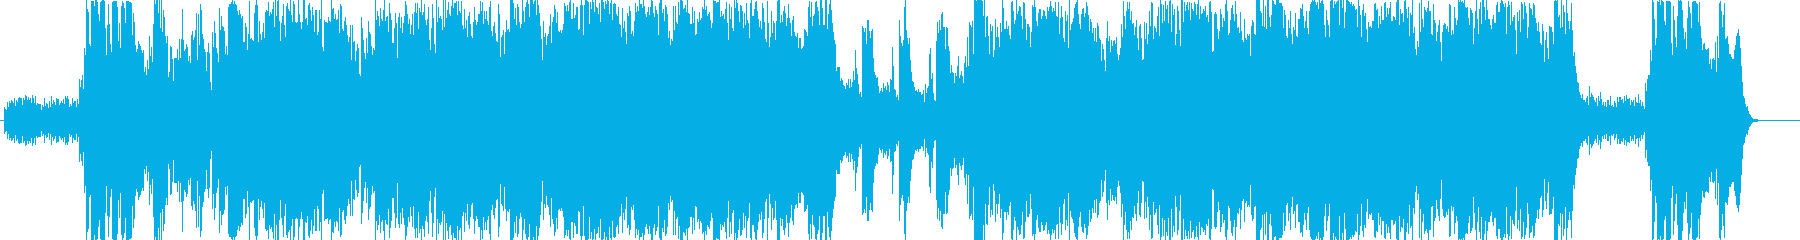 RPGのダンジョンBGMの再生済みの波形